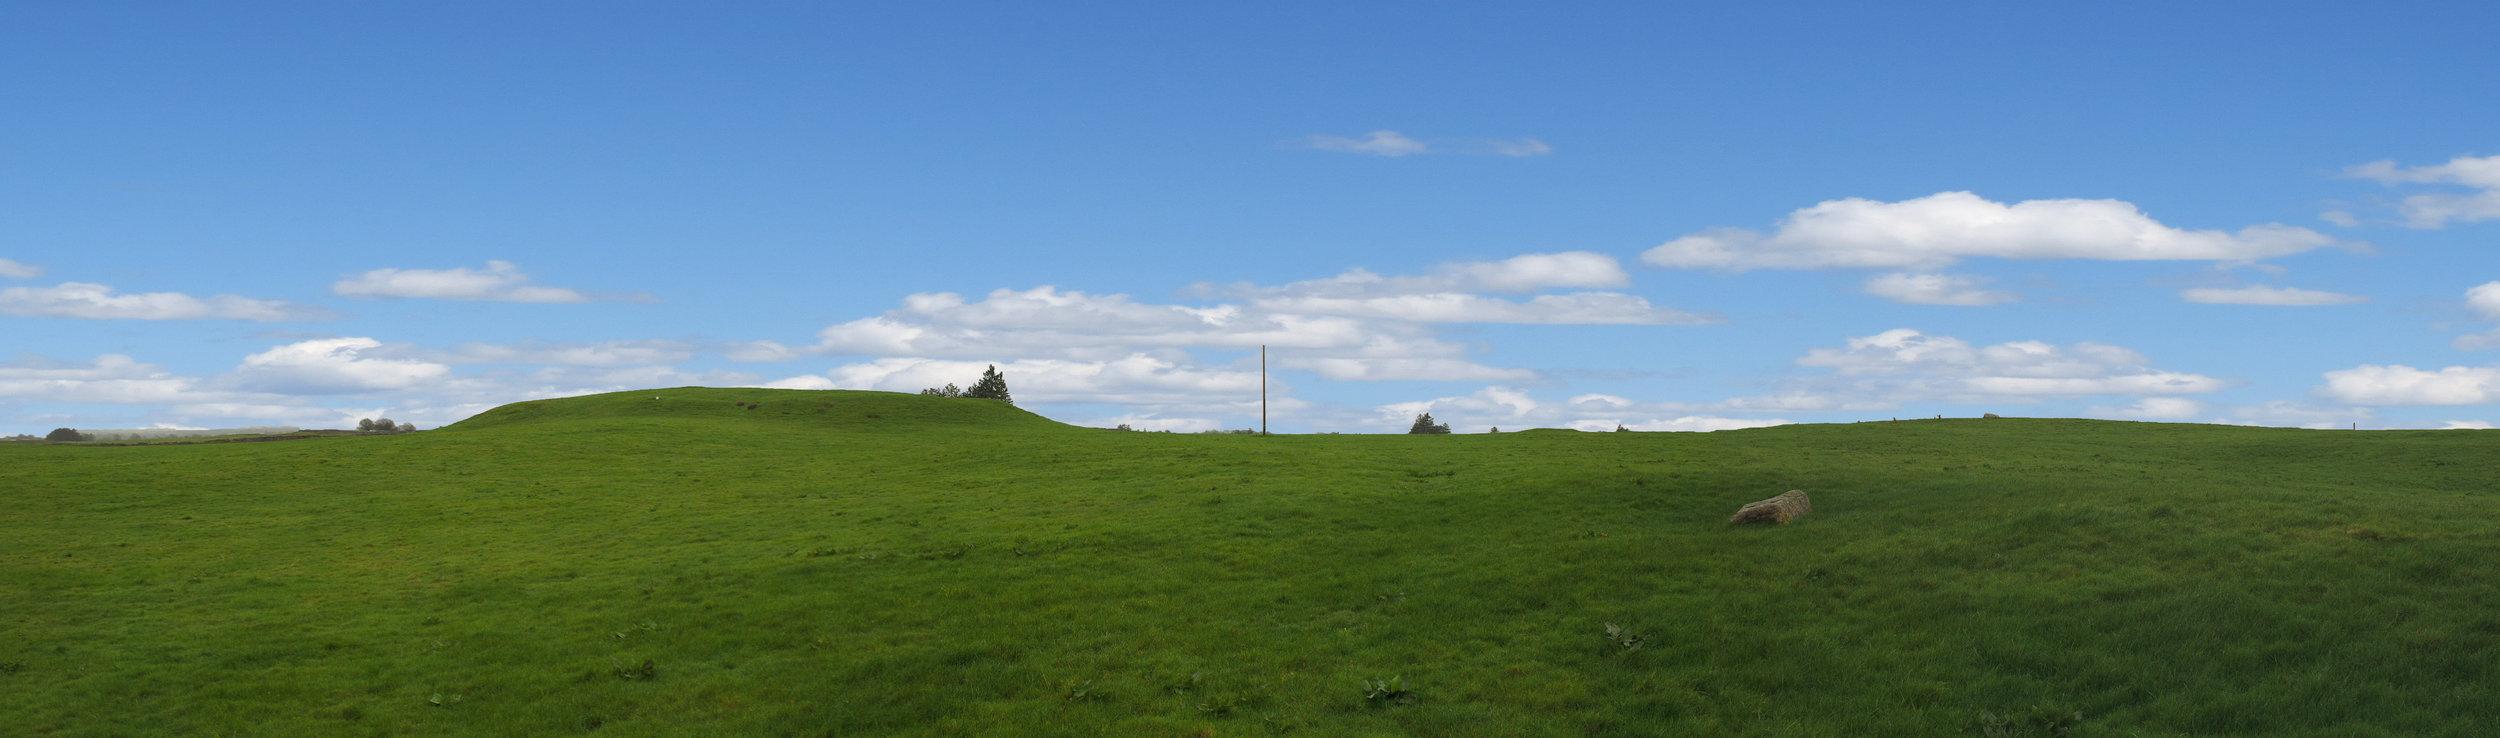 Rathcroghan Mound - Gary Dempsey 2014